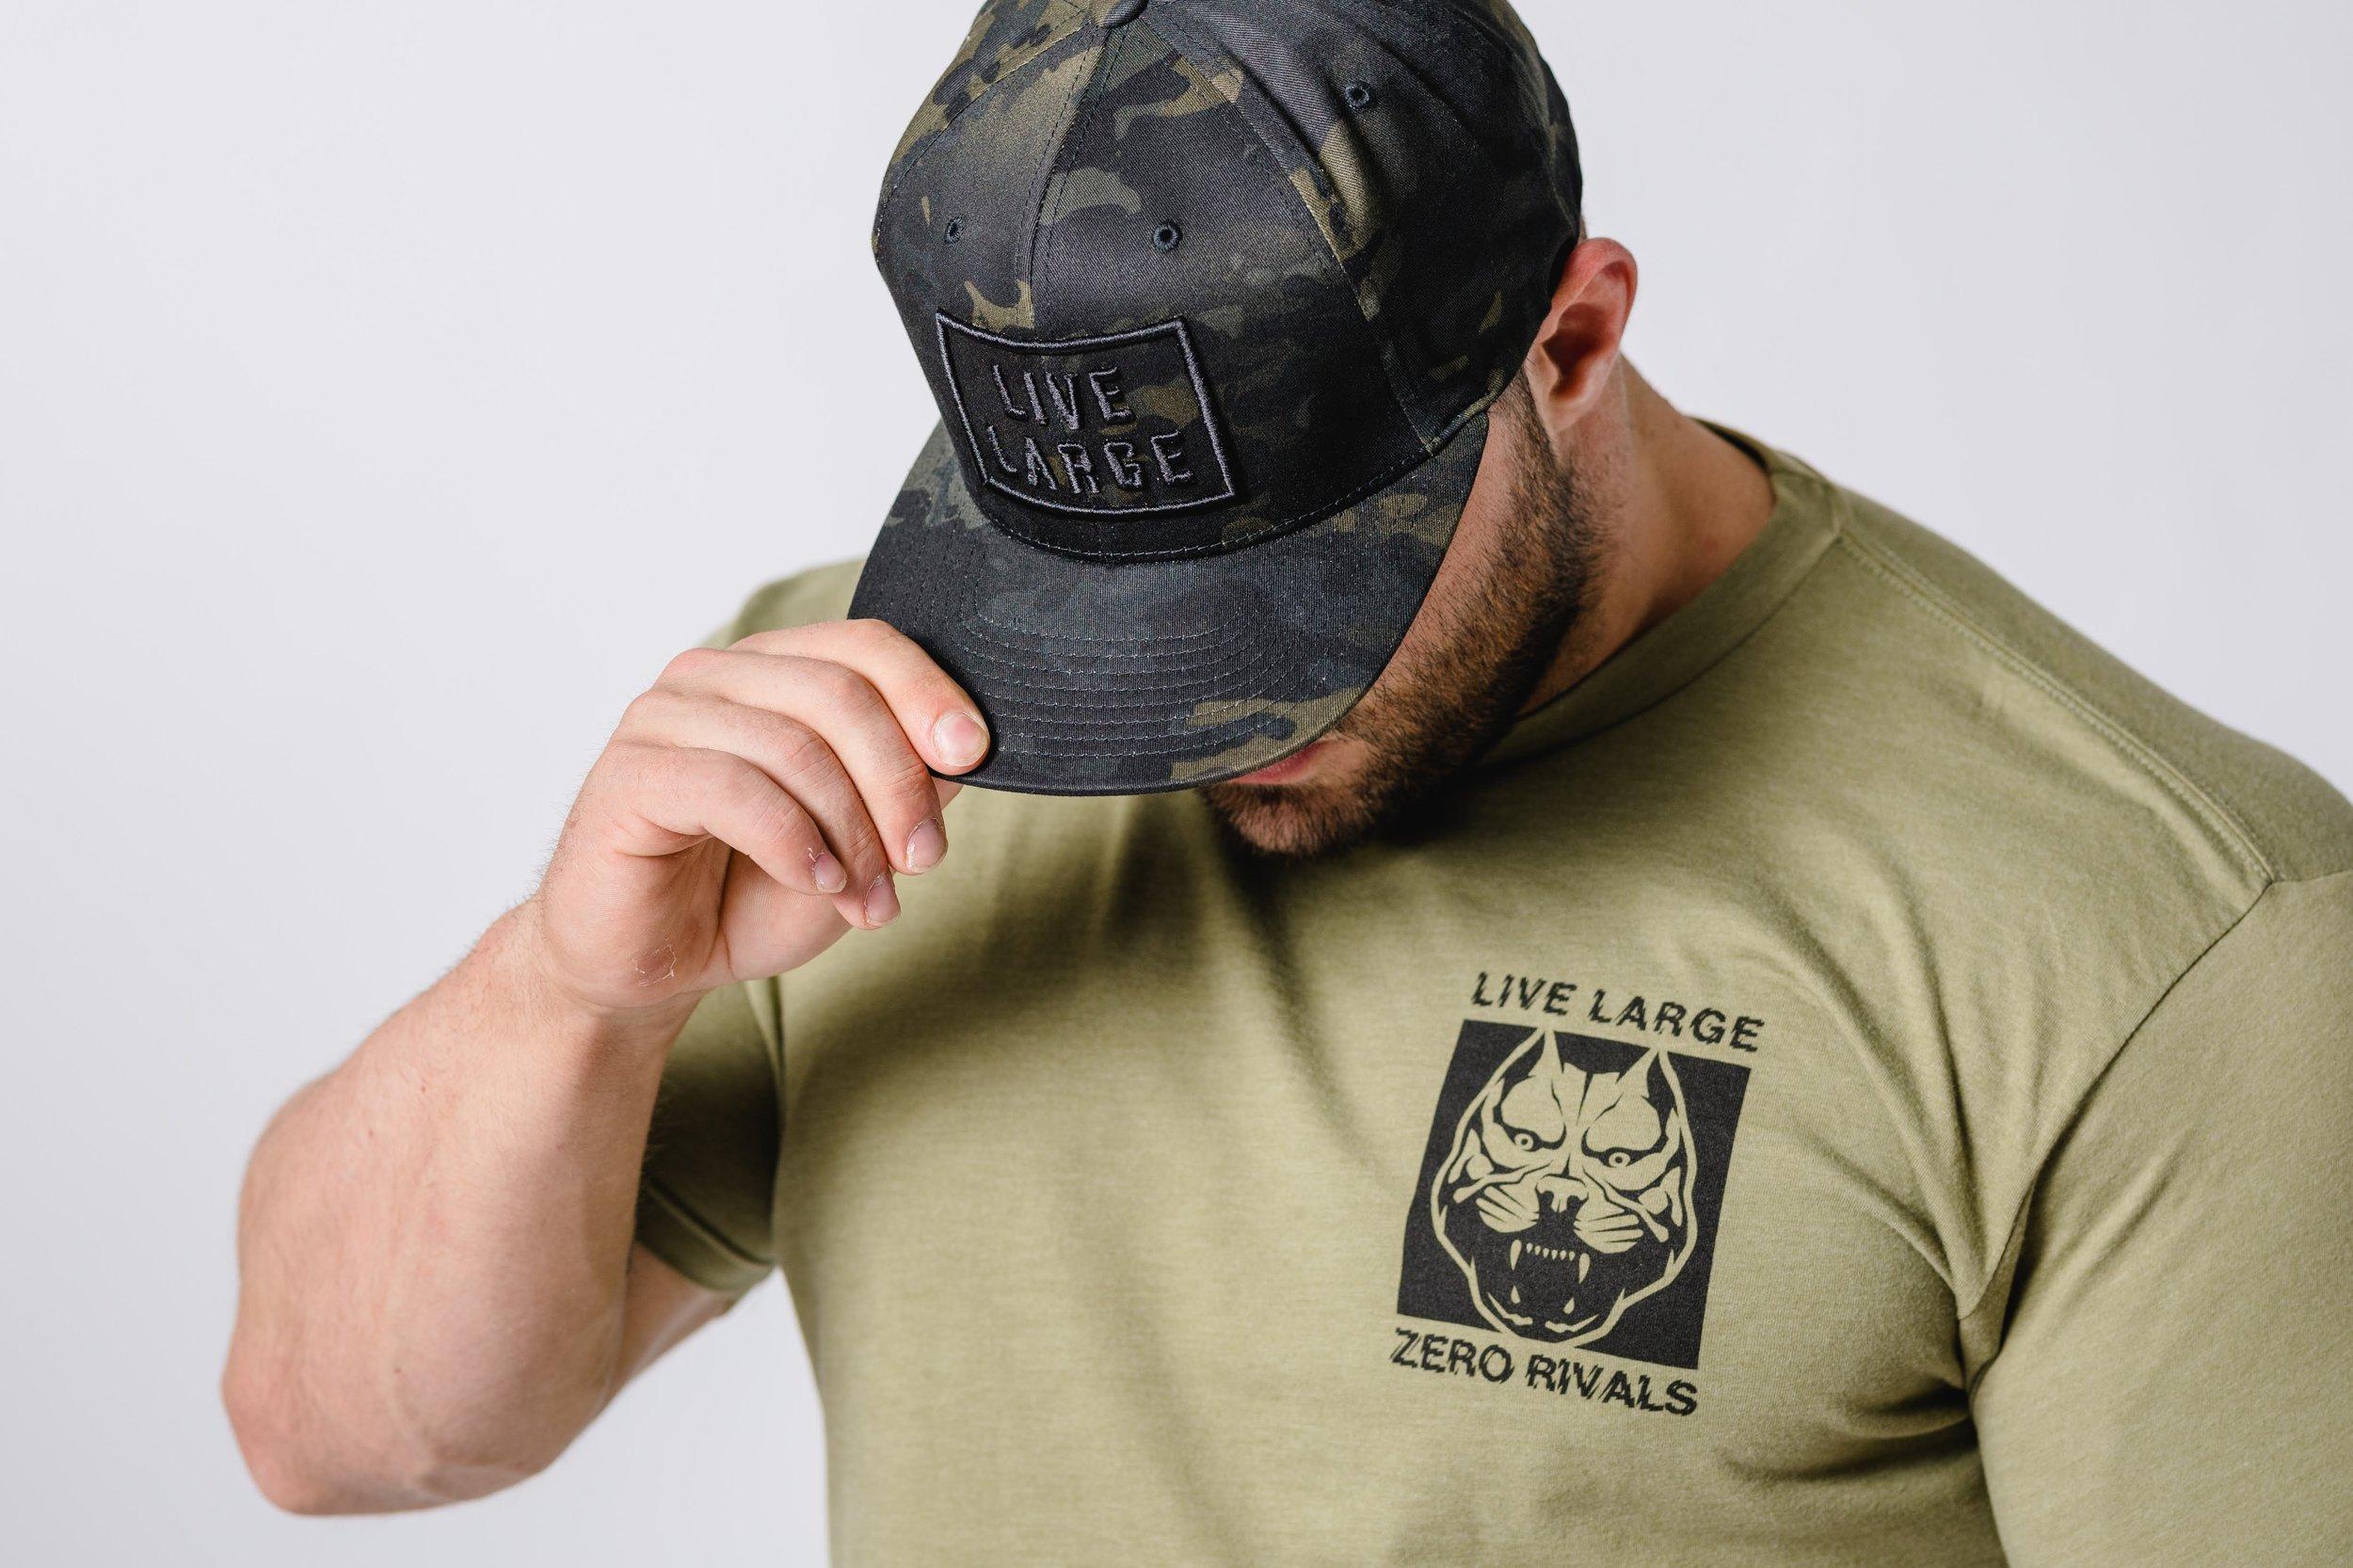 chuck army tee and hat.jpg